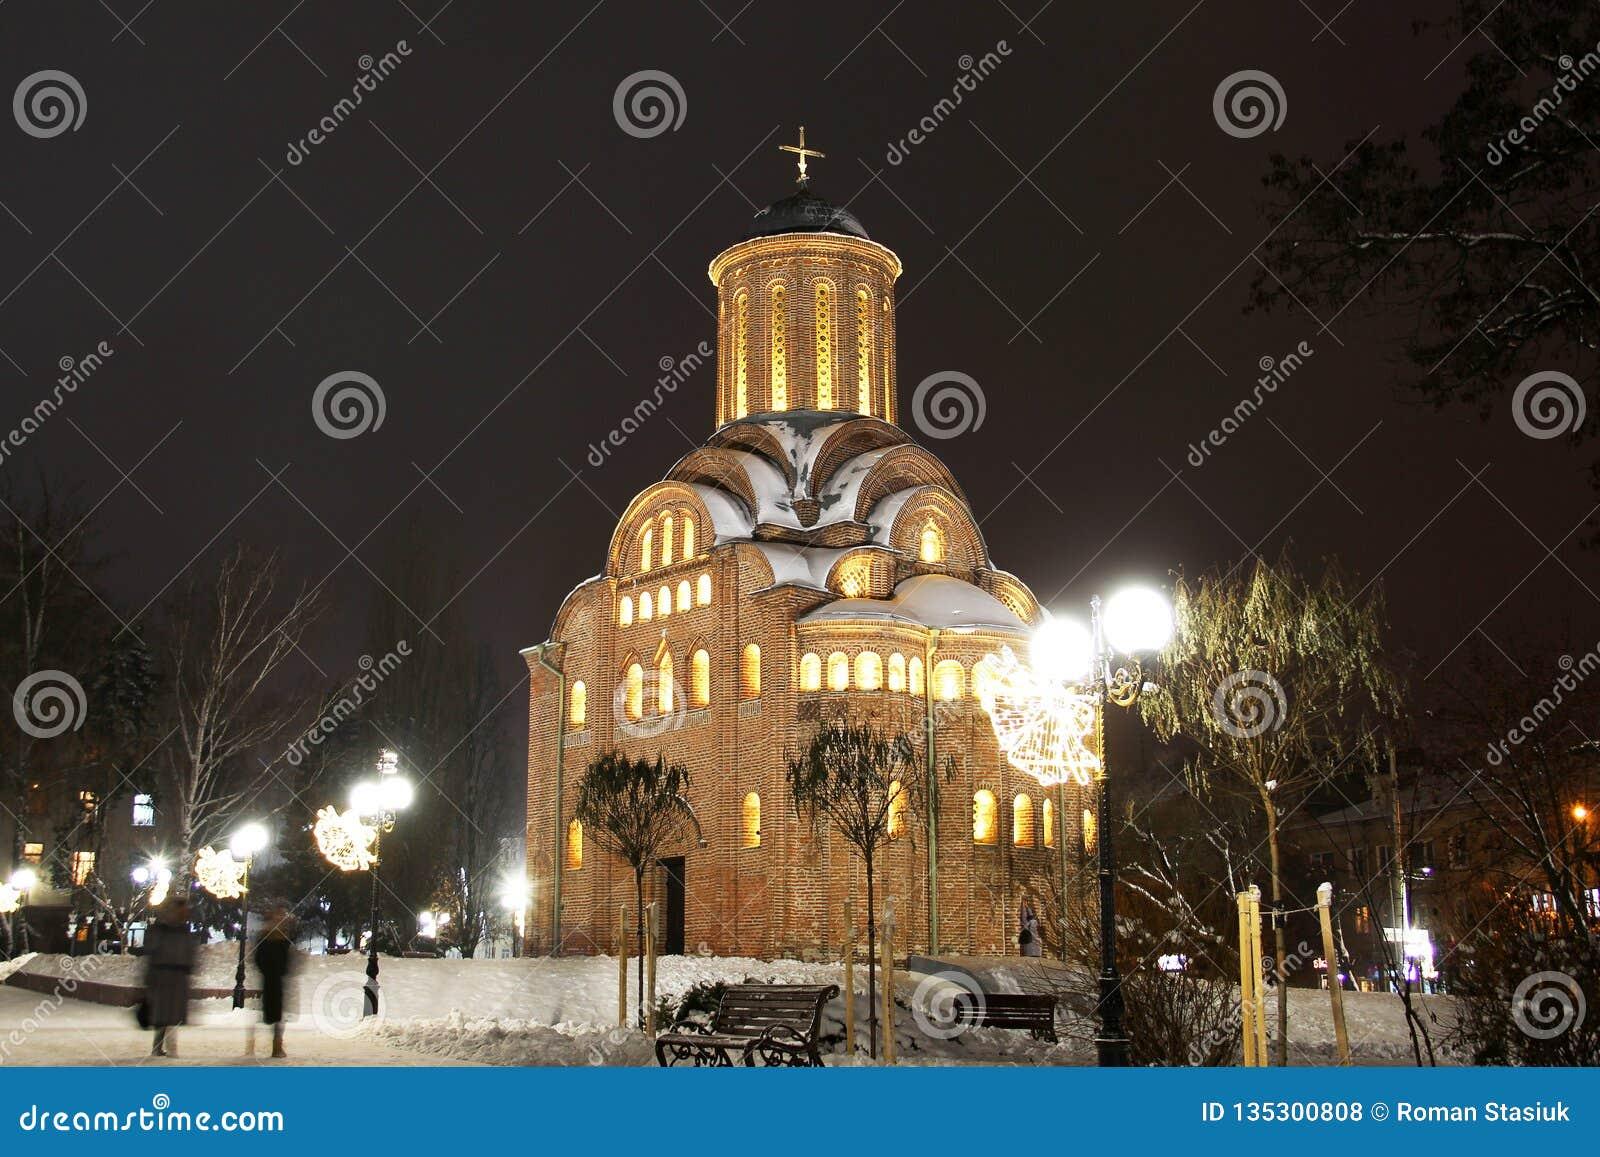 Church in the winter. Night city